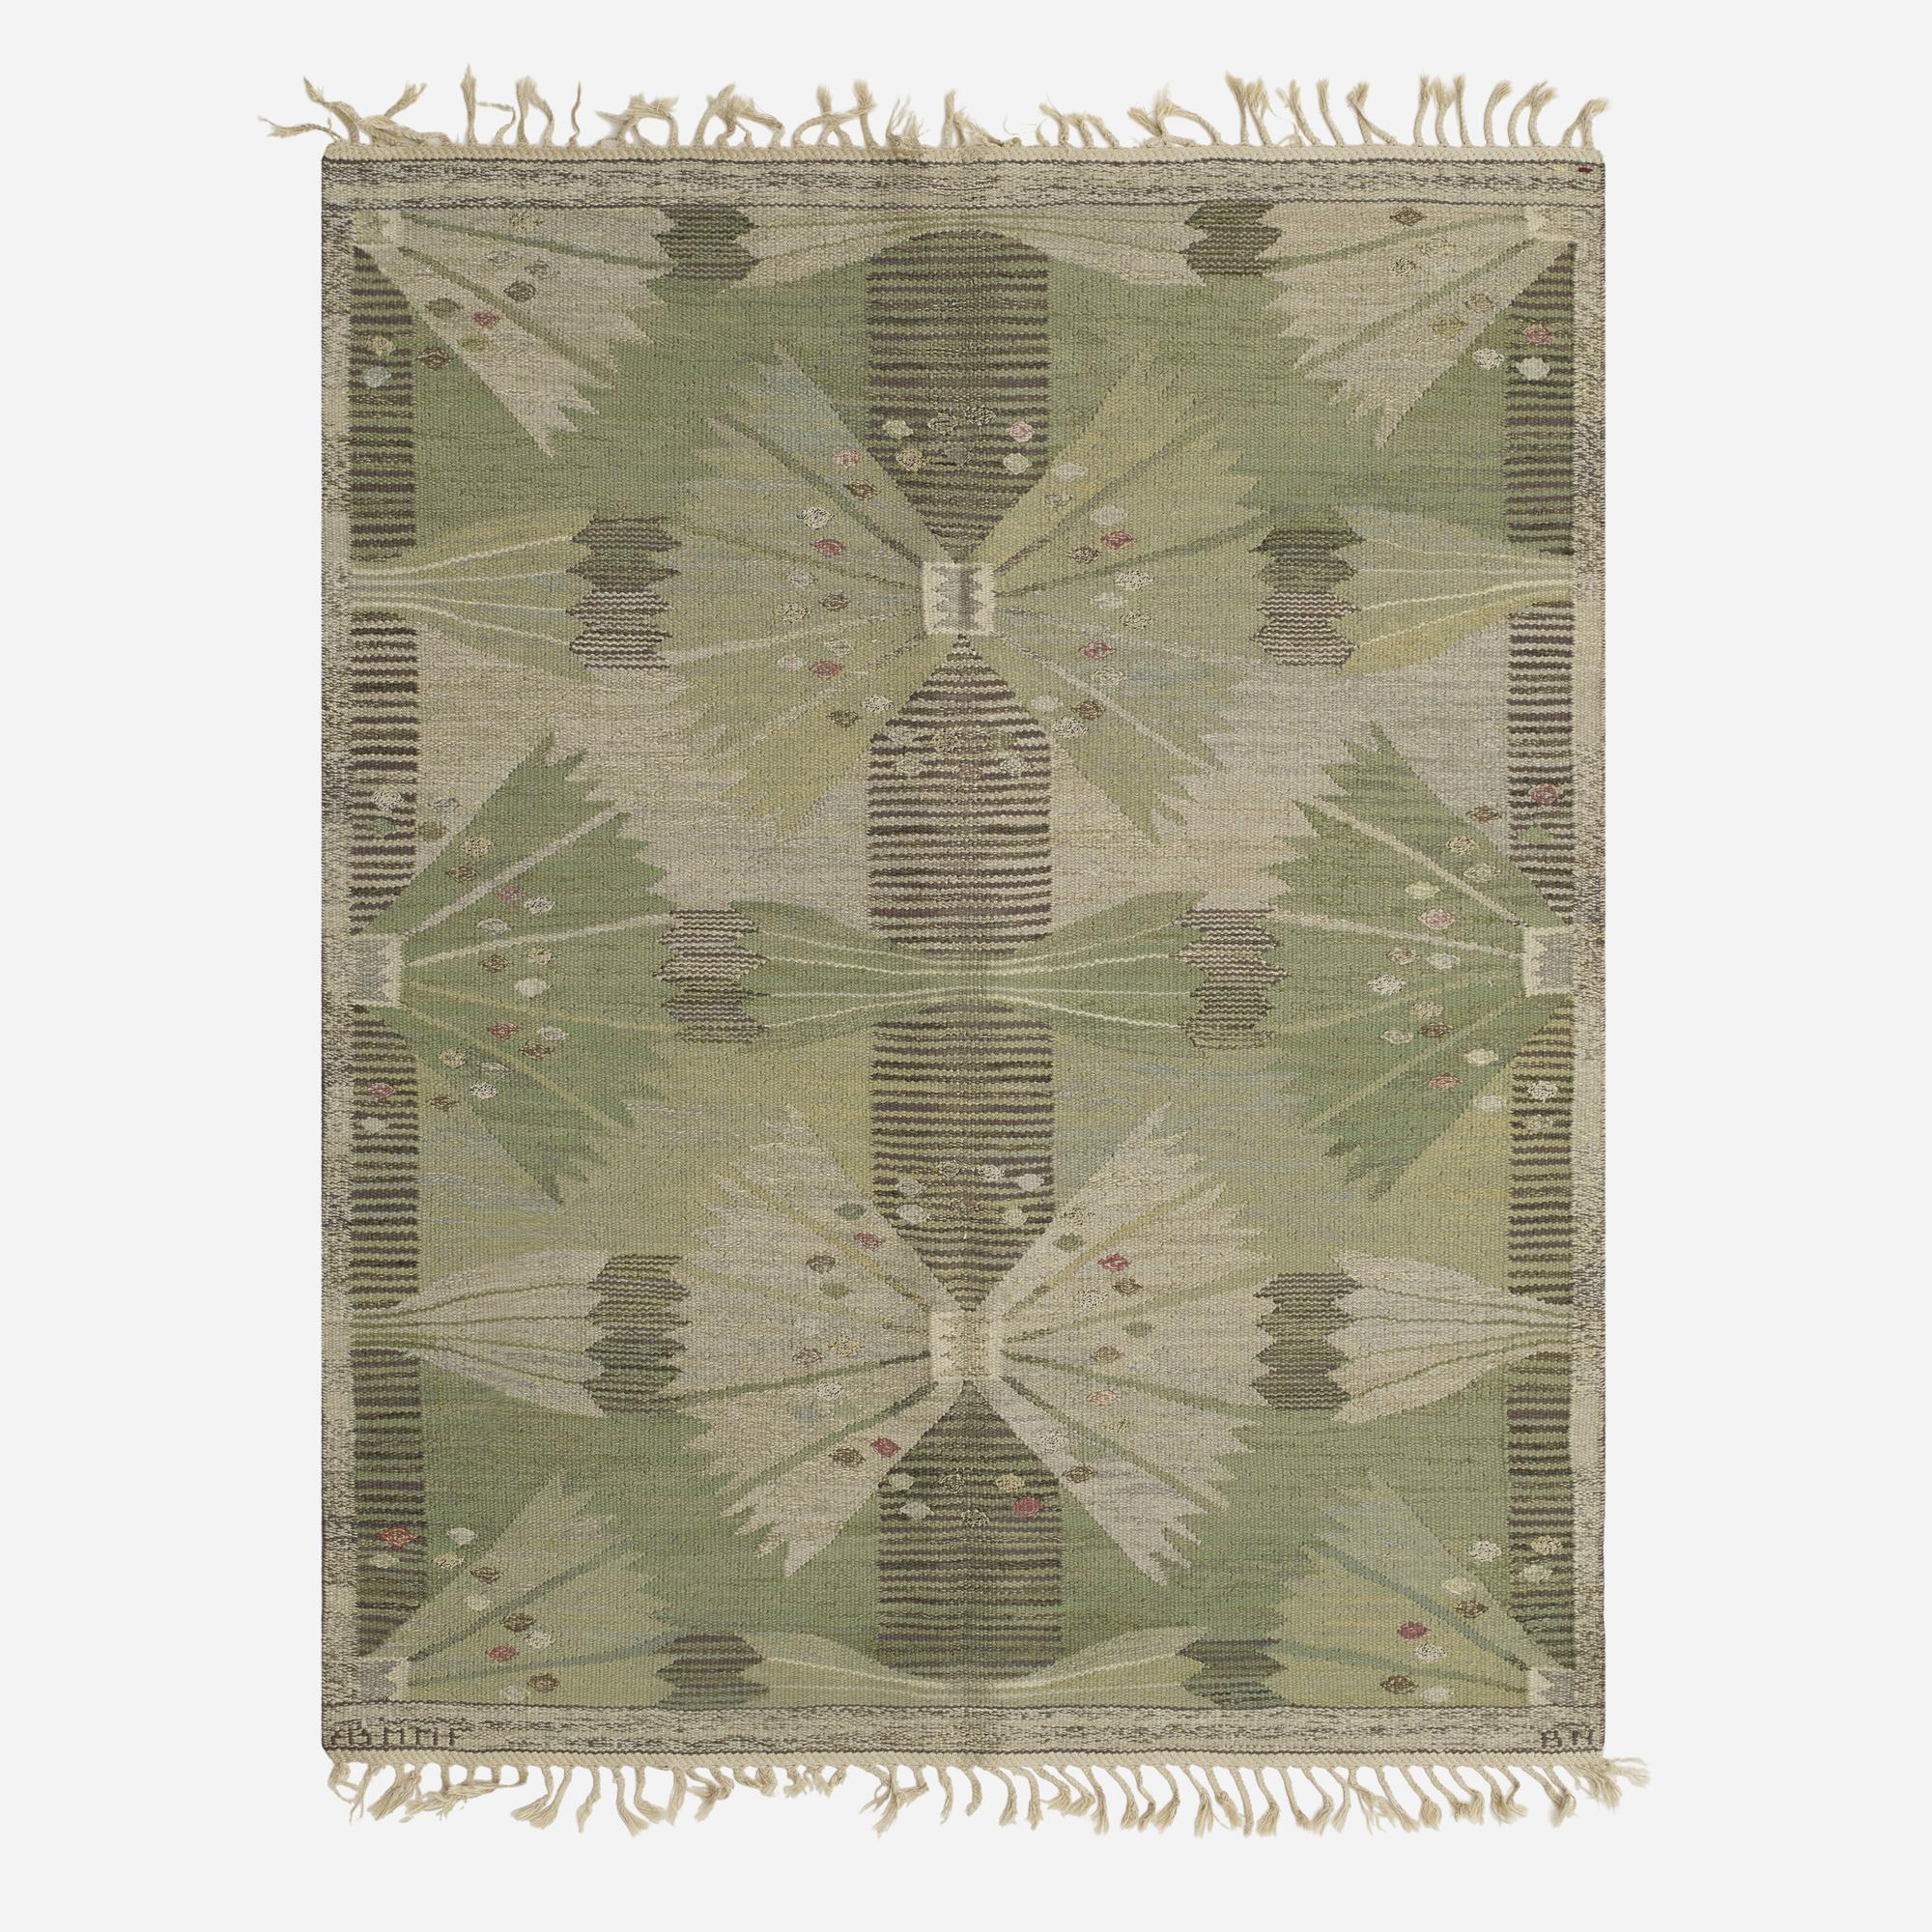 113: Barbro Nilsson / The Park, Falkman tapestry weave carpet (1 of 2)